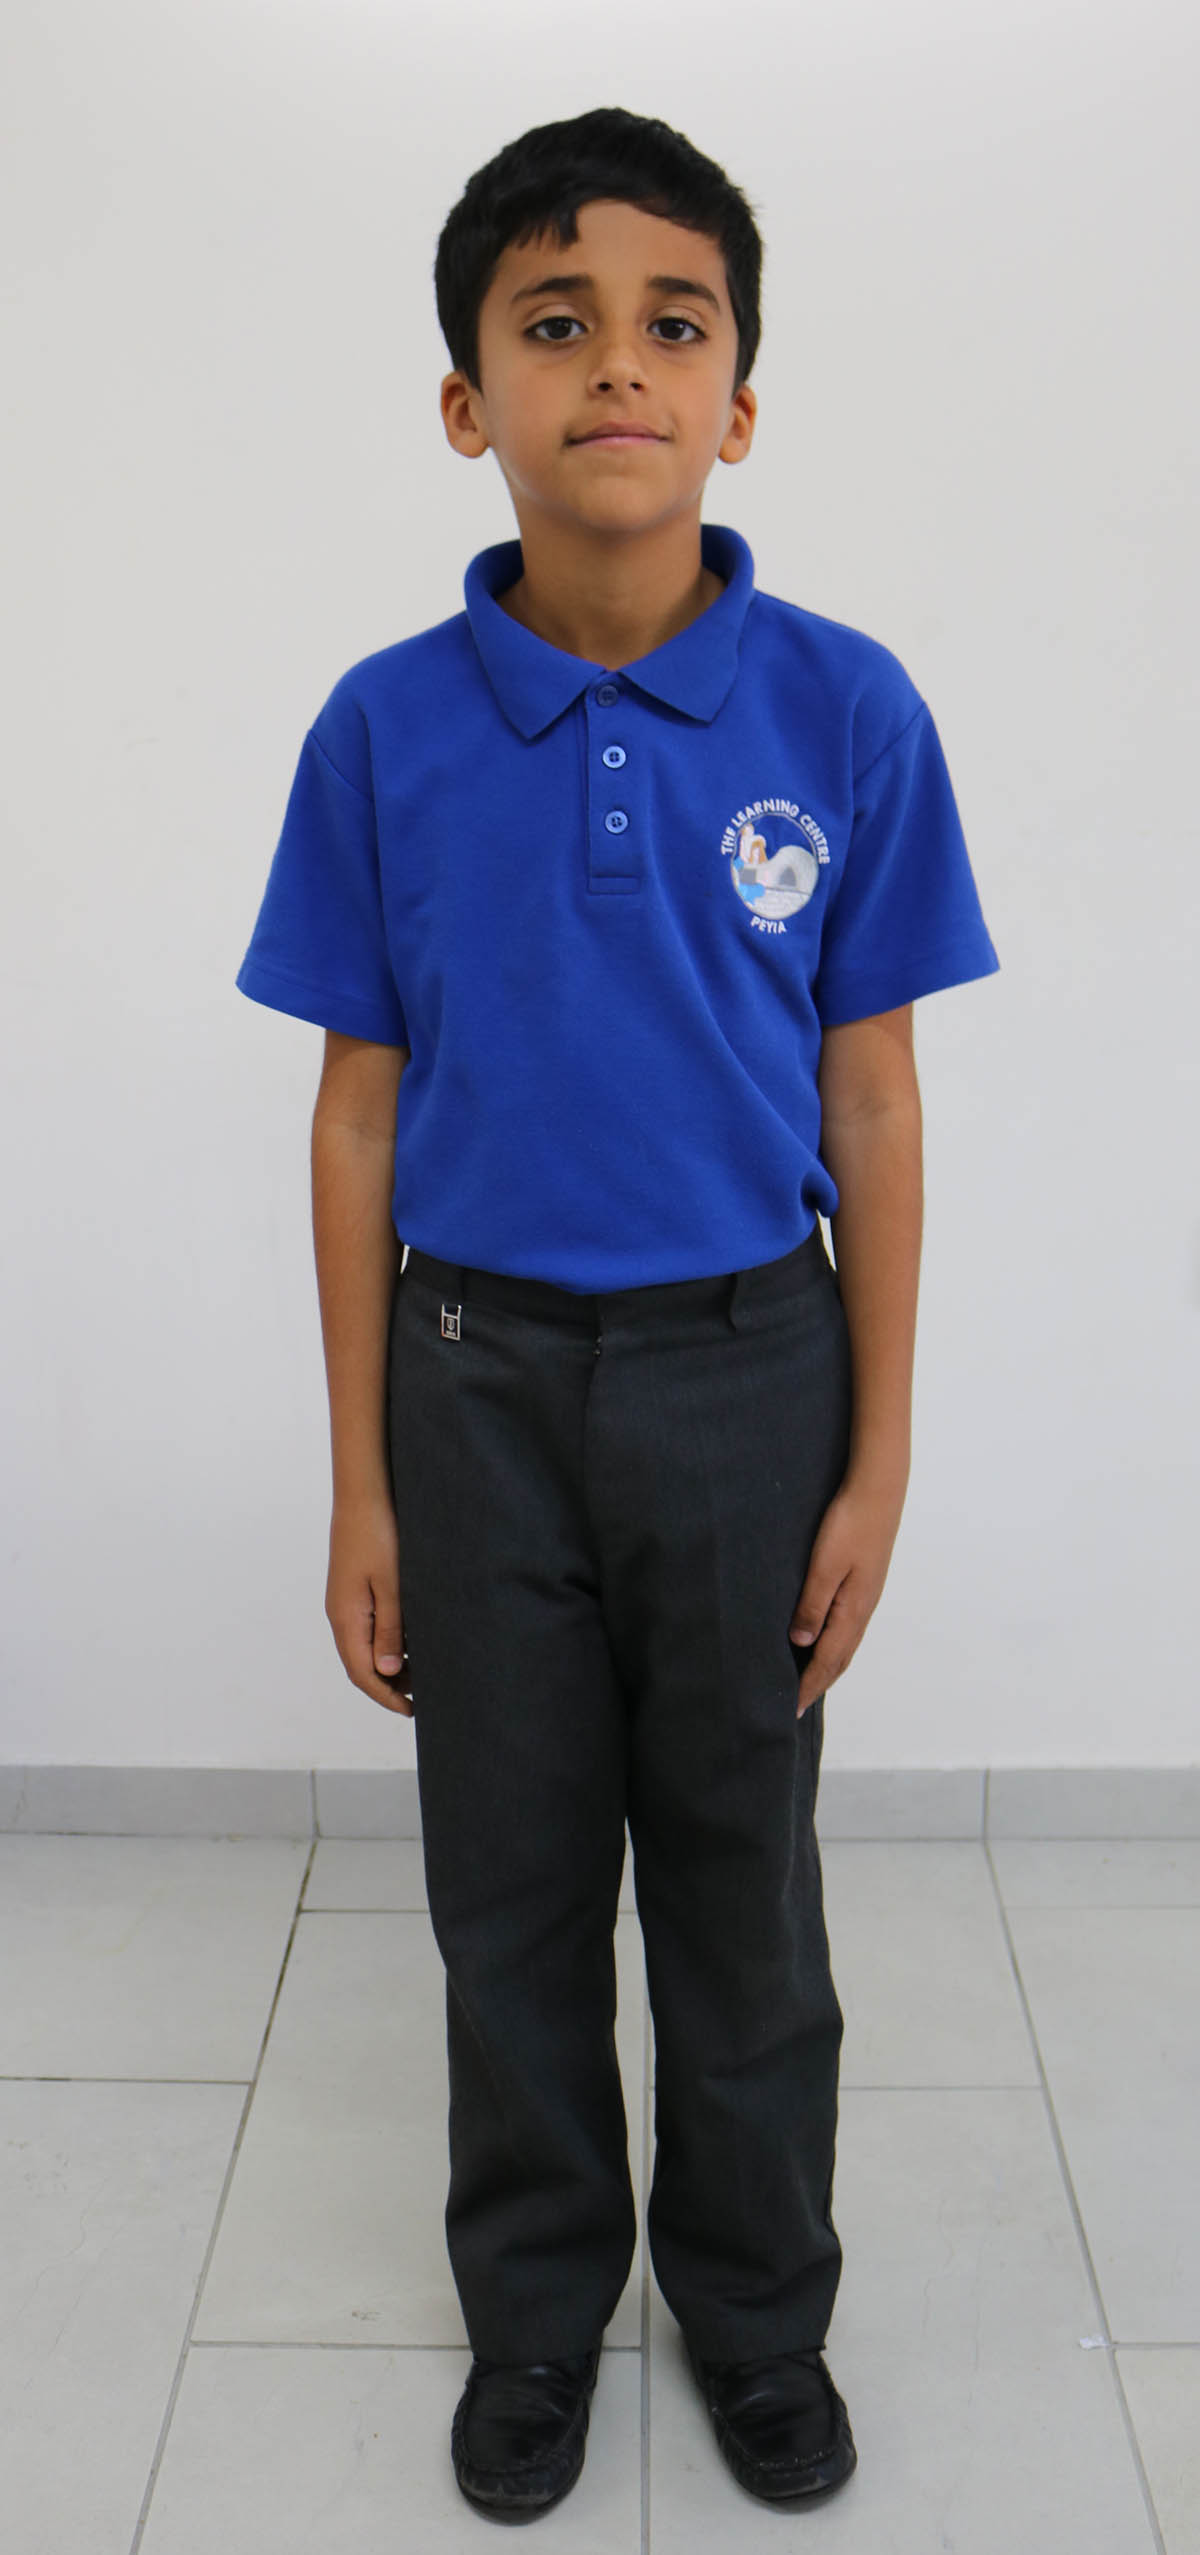 TLC Private School - School Uniform - Primary